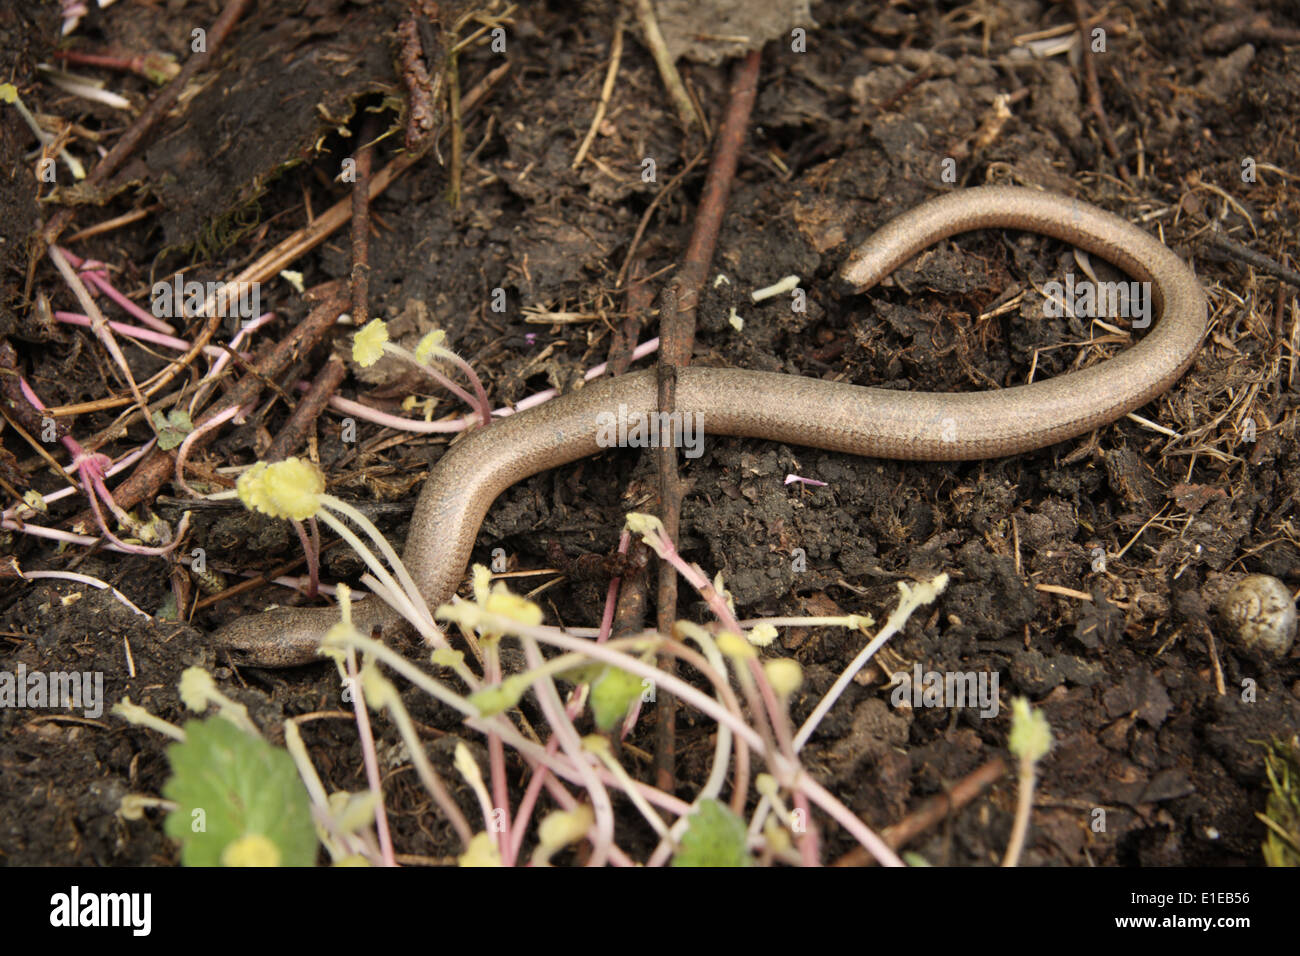 Male Slow-worm Stock Photo